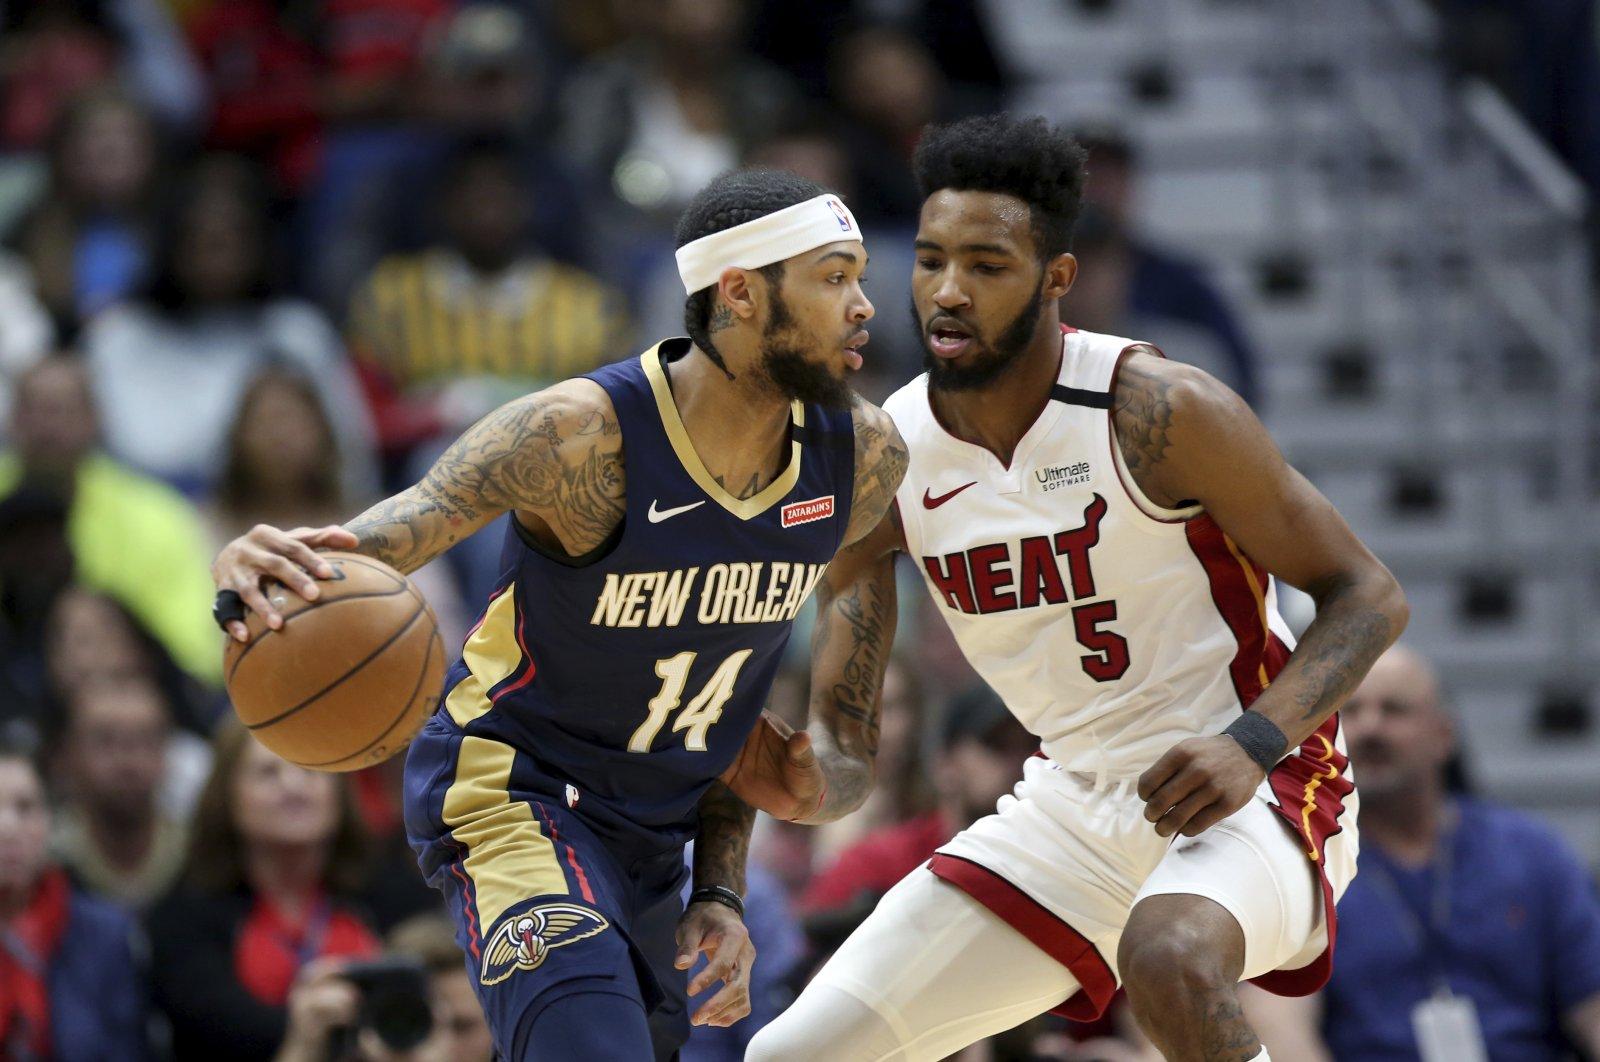 New Orleans Pelicans forward Brandon Ingram (14) dribbles as Miami Heat forward Derrick Jones Jr. (5) defends during an NBA game in New Orleans, U.S., March 6, 2020. (AP Photo)